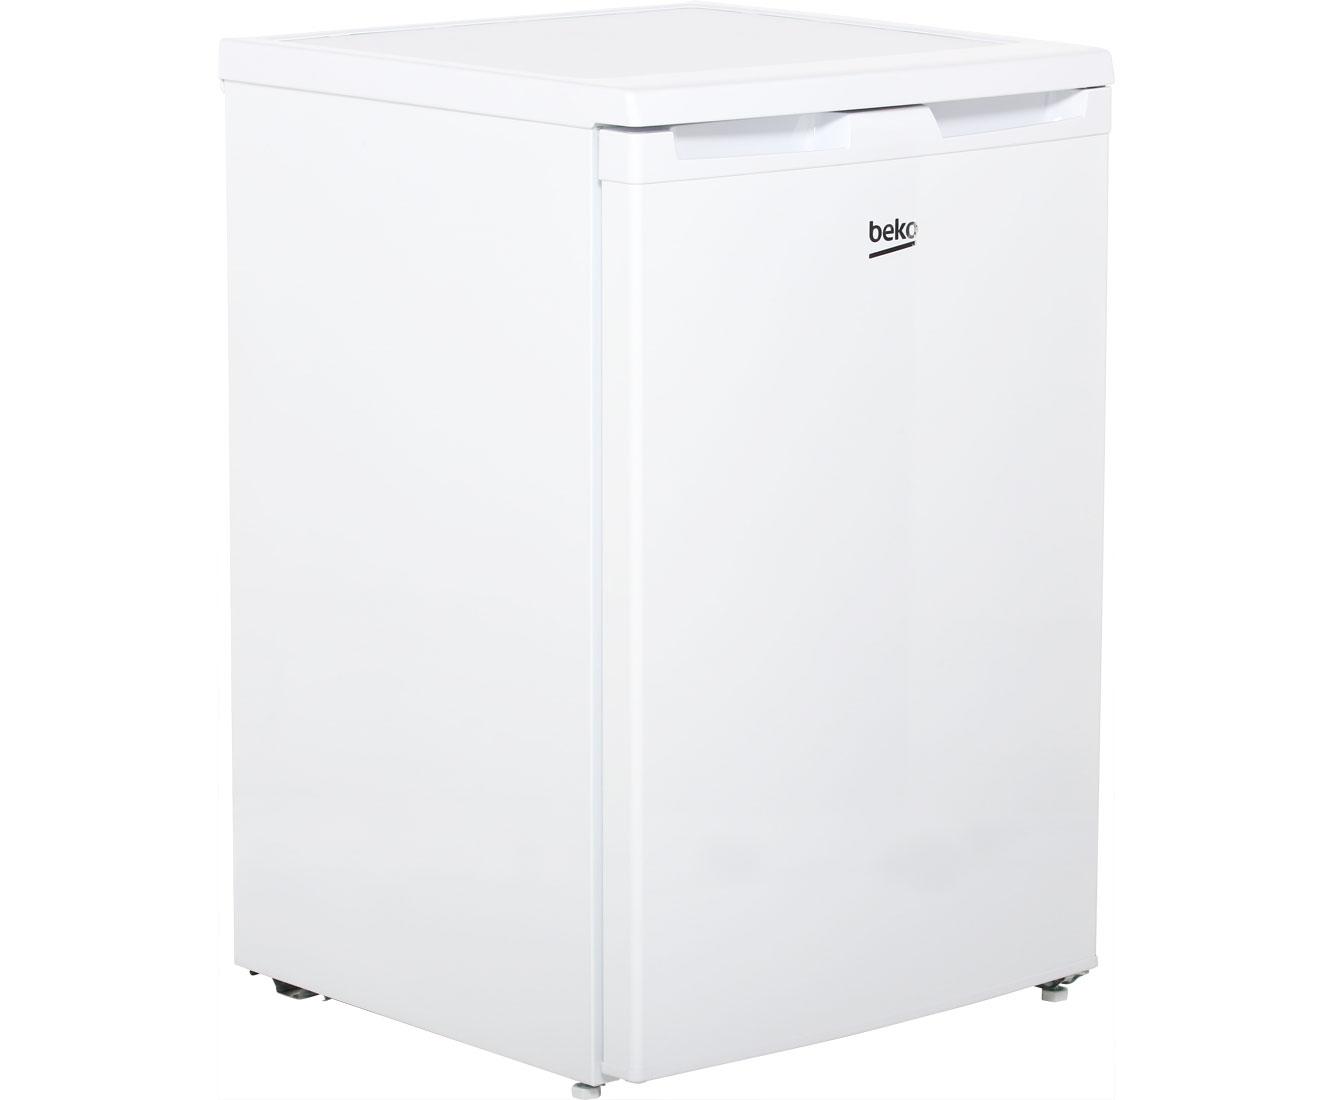 Beko TSE1284 Kühlschränke - Weiß